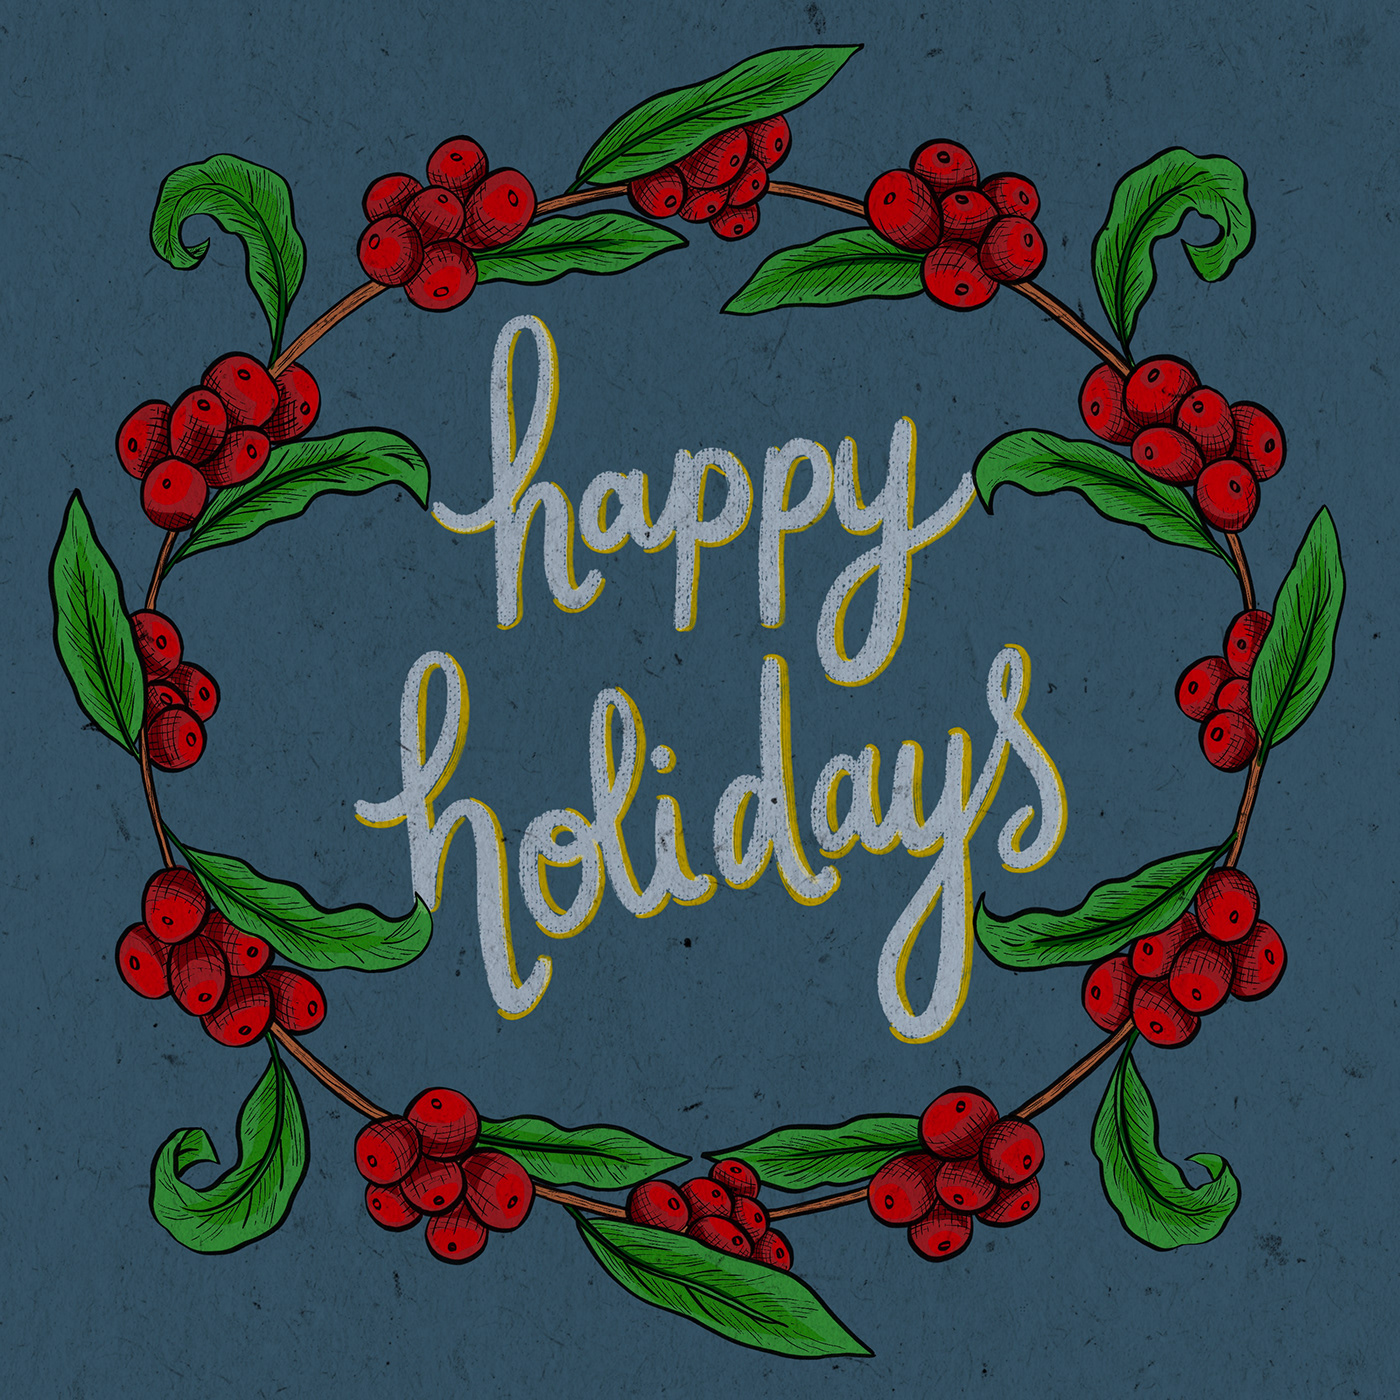 Coffee coffee cherries crosshatching Handlettering holidays typography   wreath